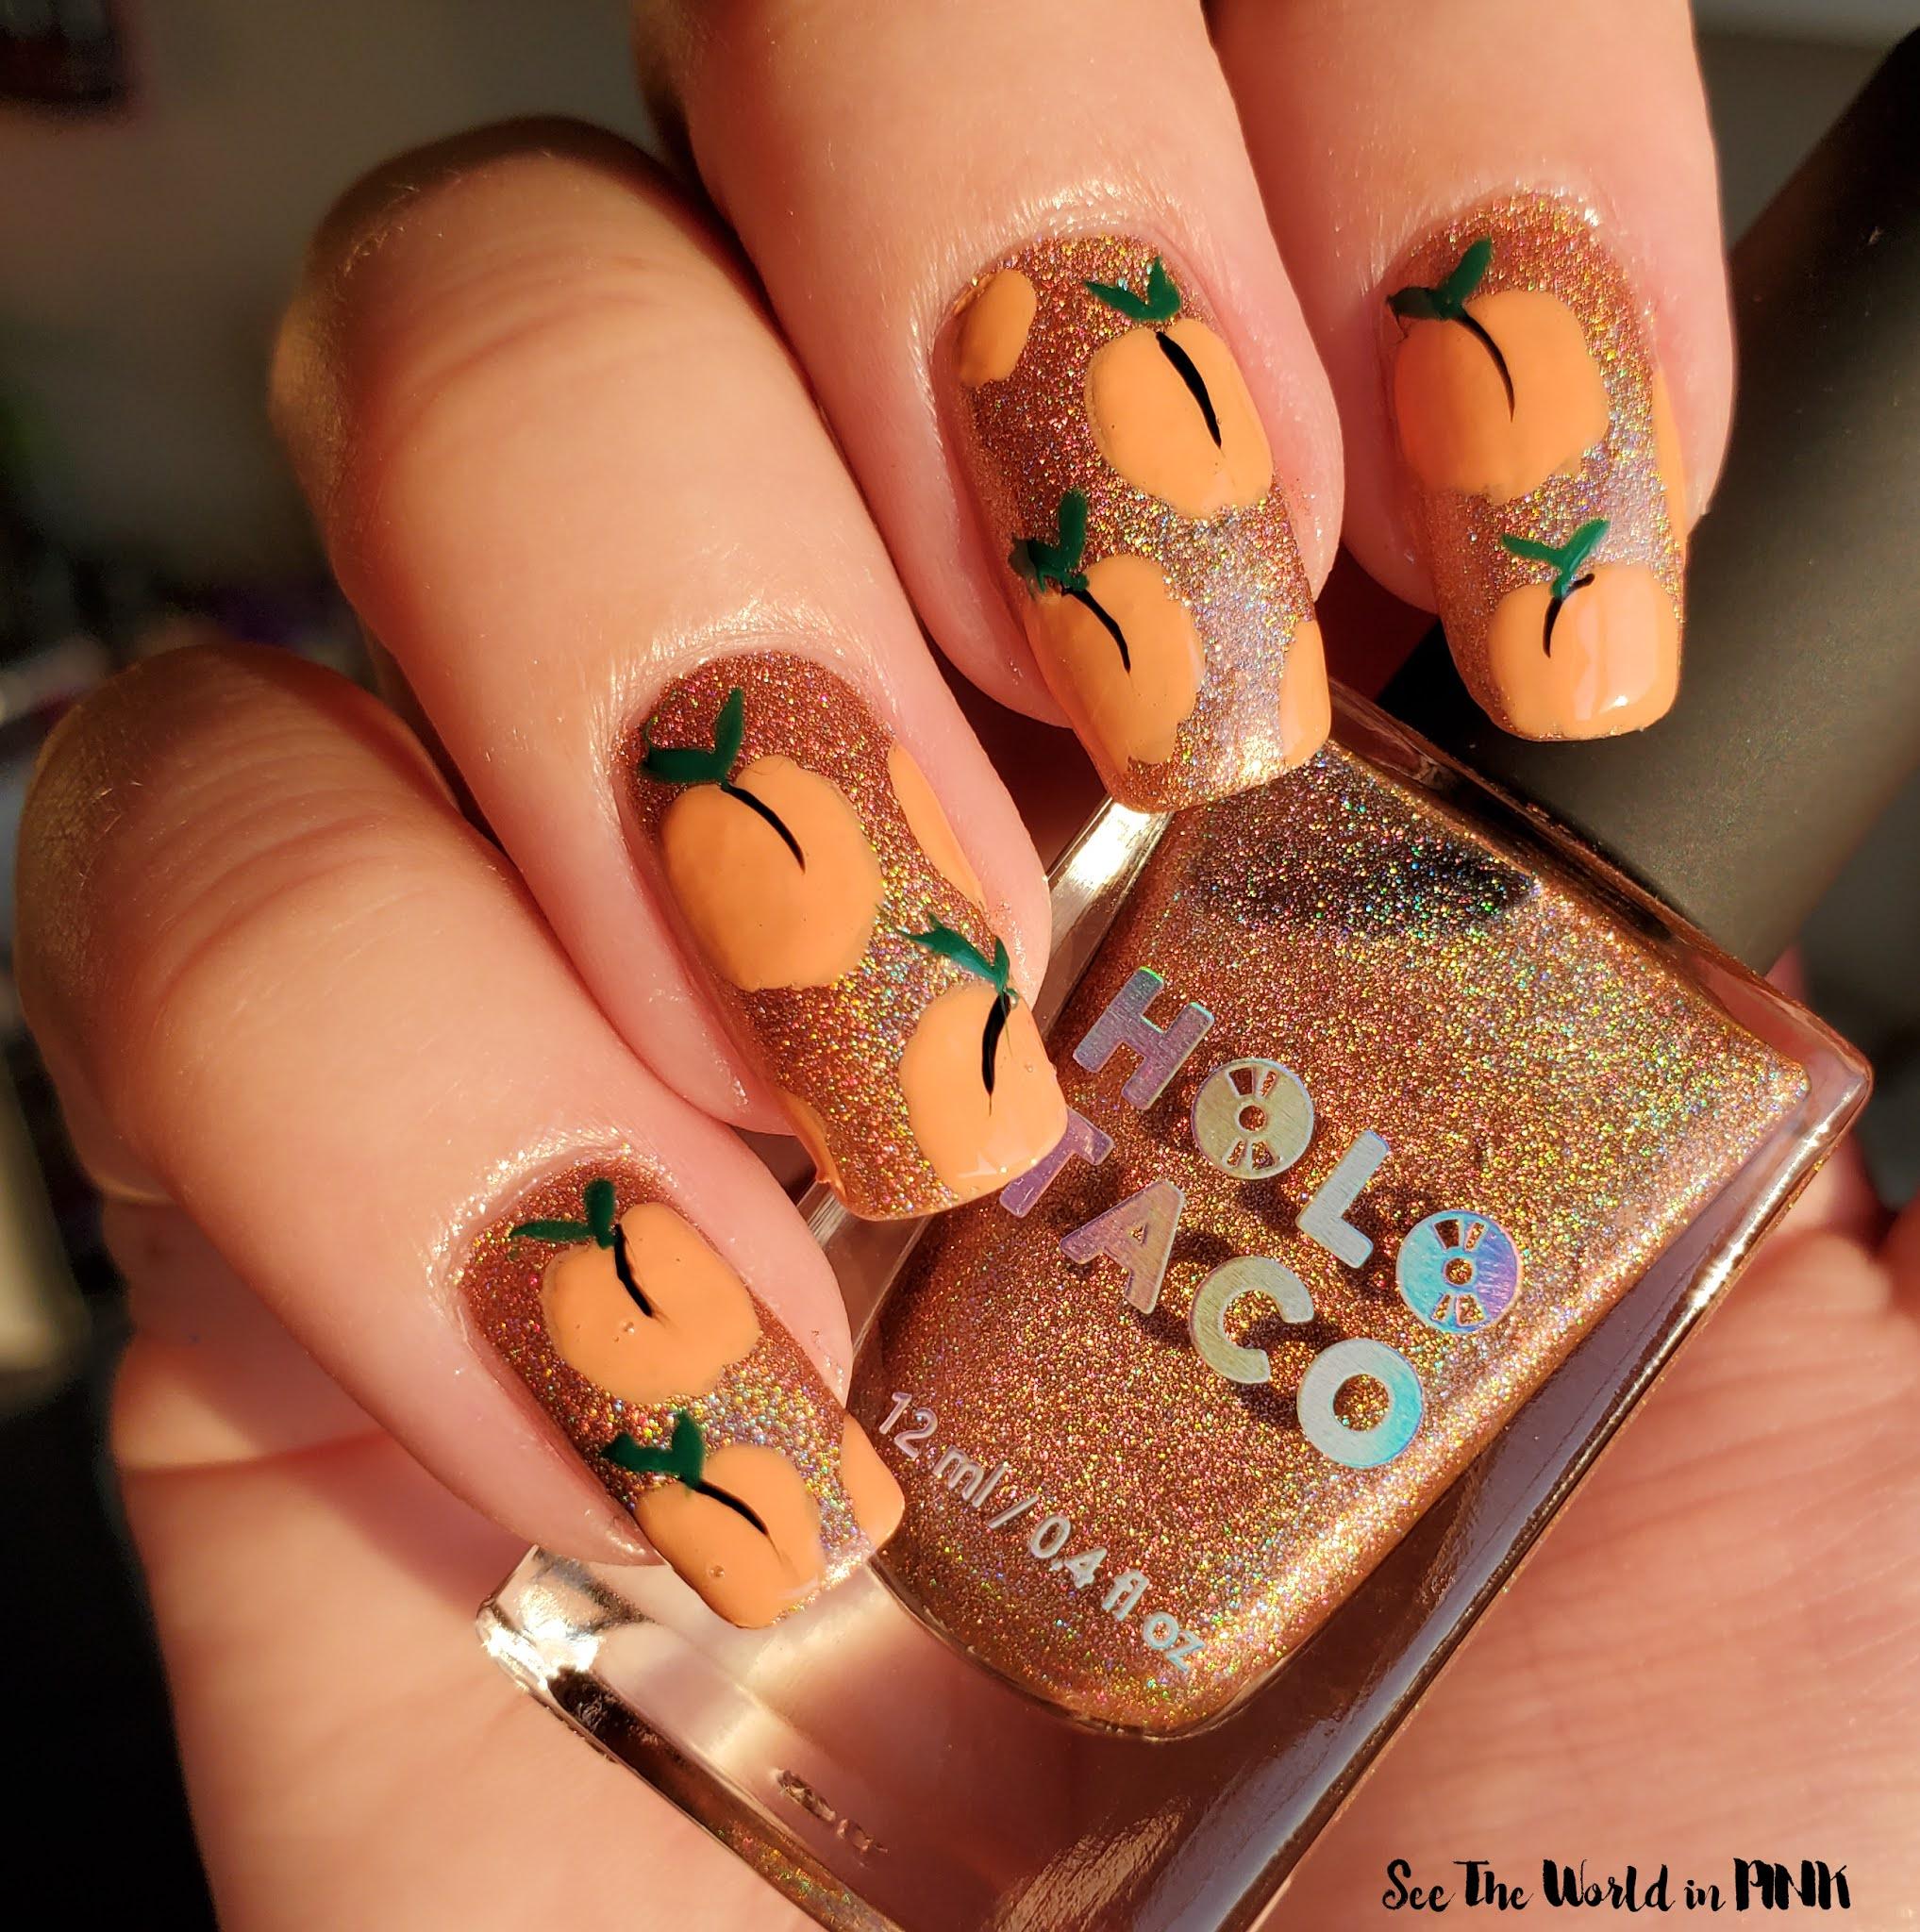 Manicure Monday - Peach Holographic Nails